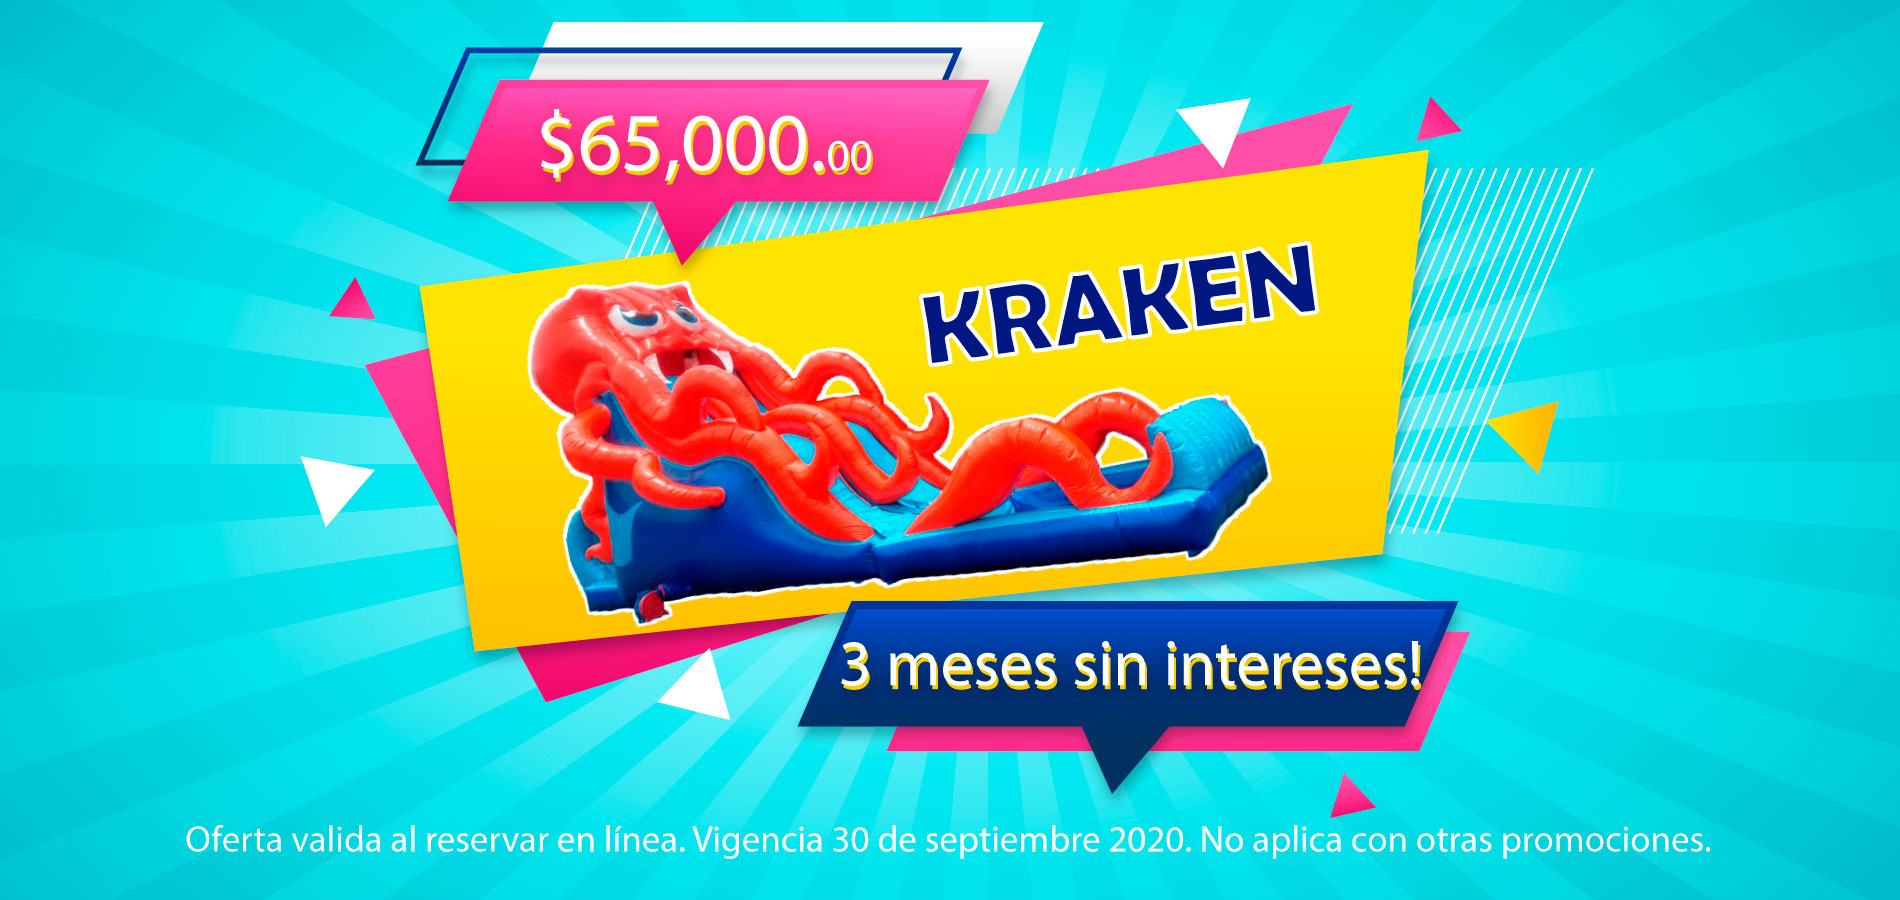 diversiones-kavier-kraken-1